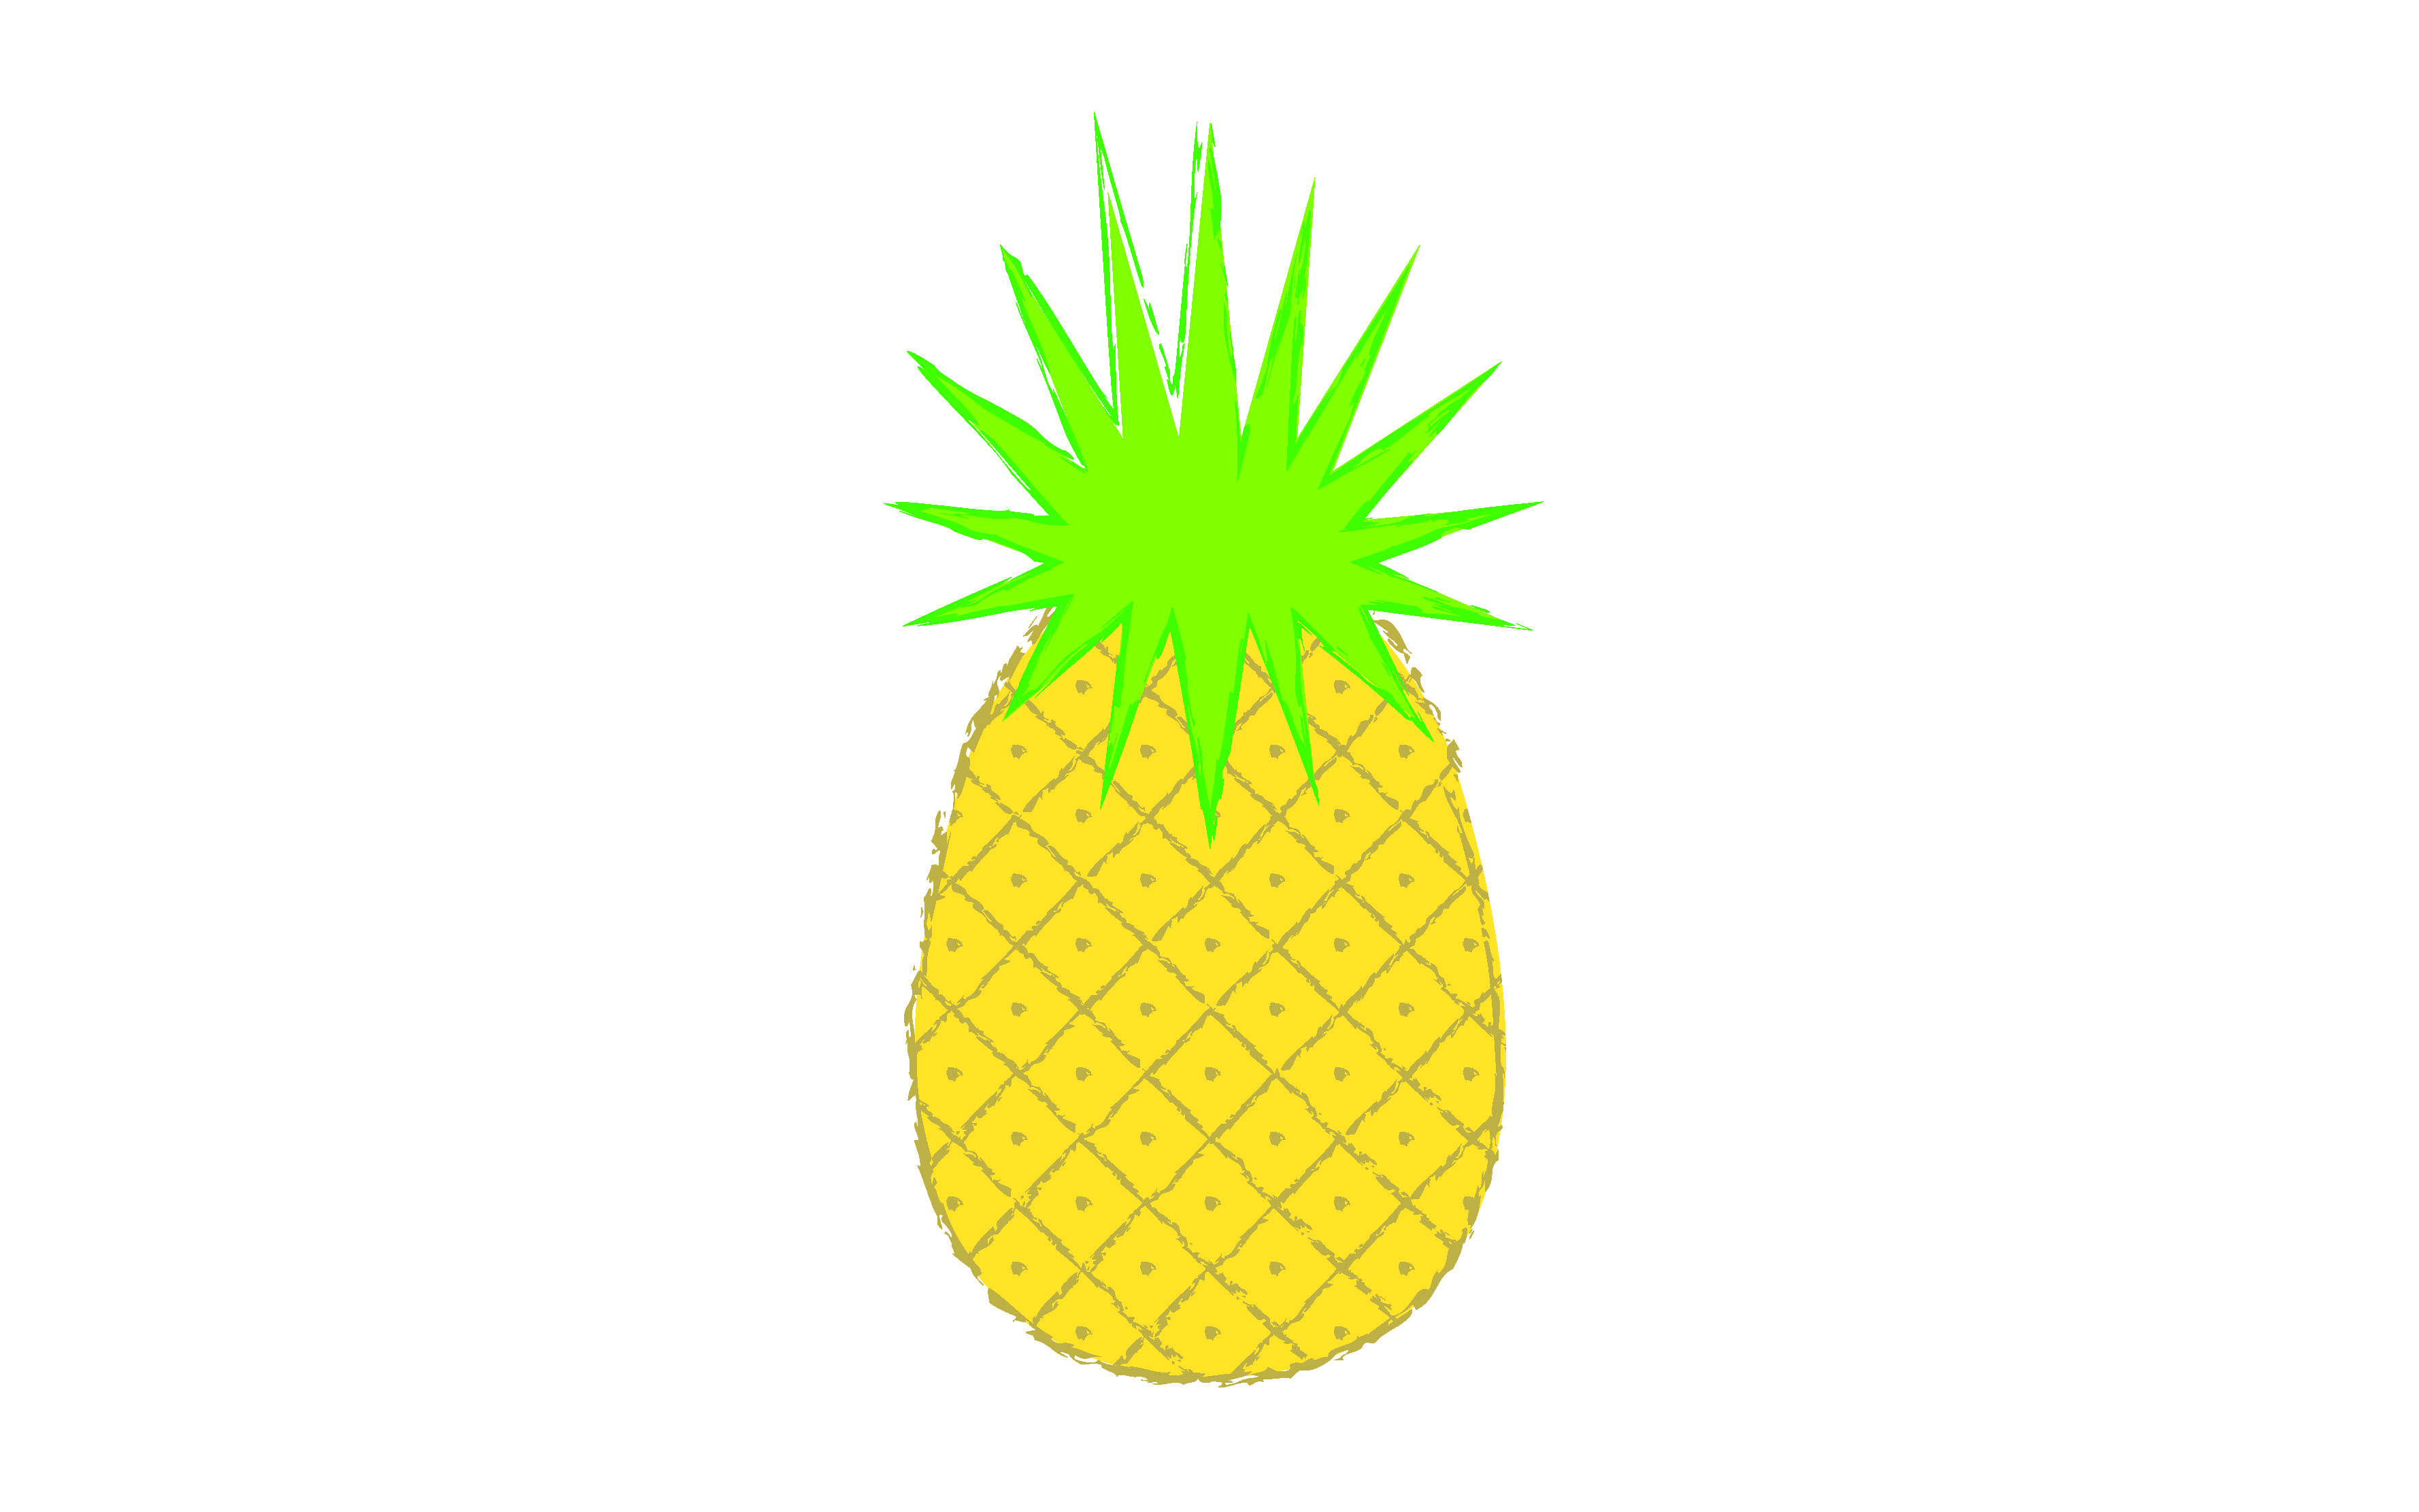 Download Wallpaper Home Screen Pineapple - pineapple-desktop-wallpaper_1  You Should Have_28143.jpg